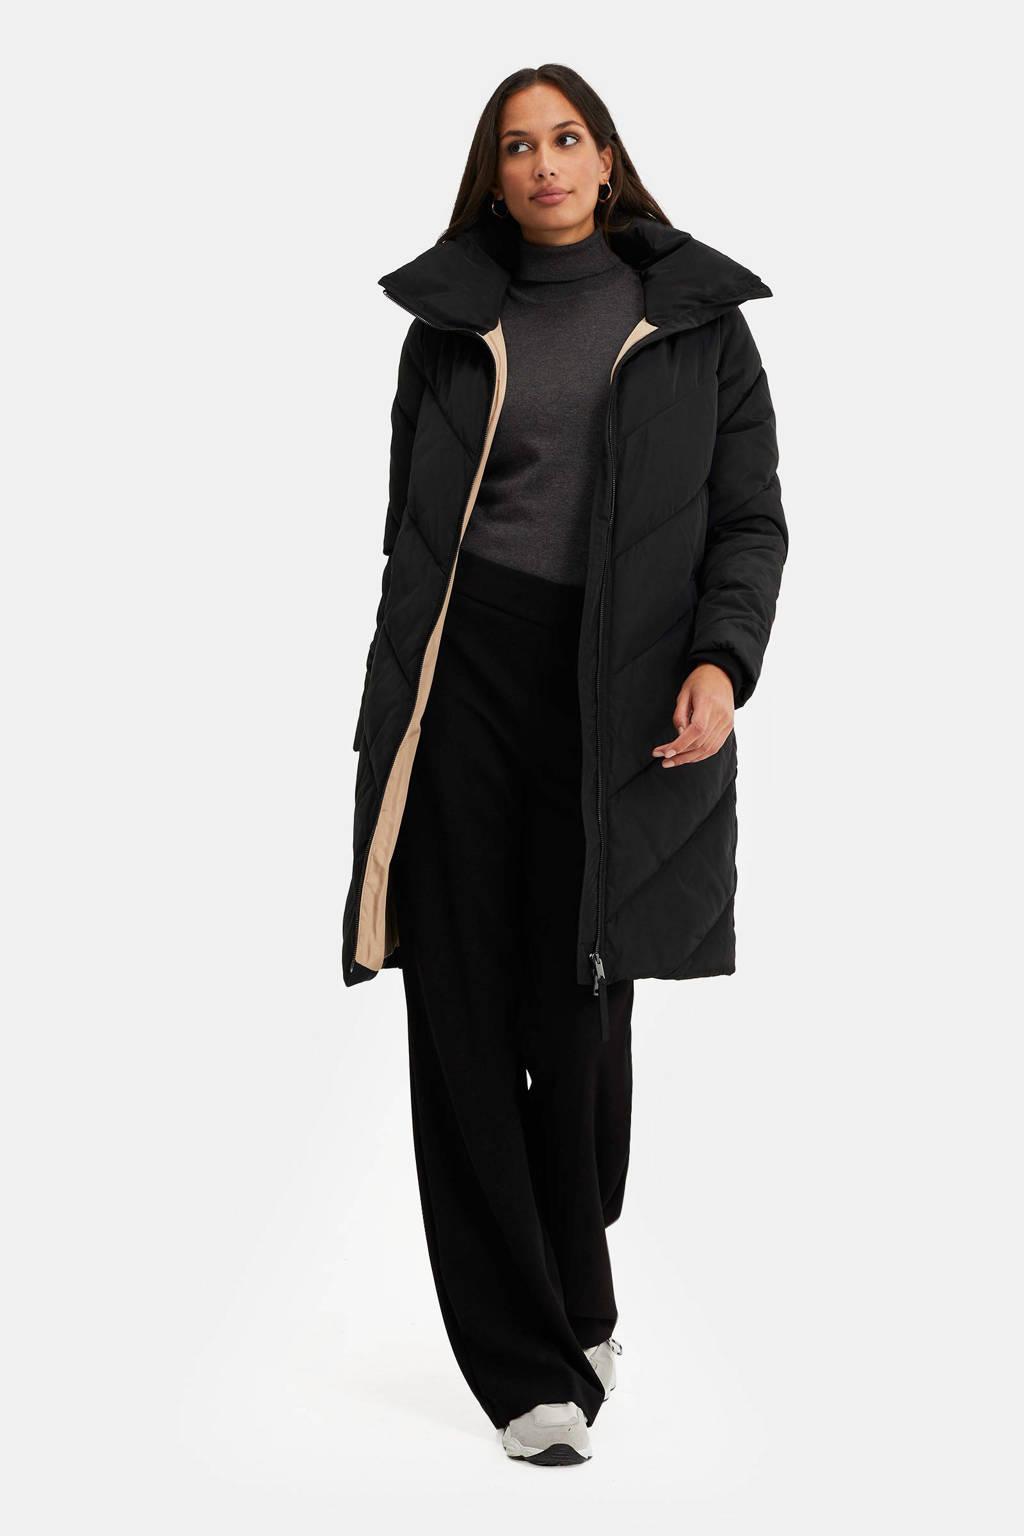 WE Fashion gewatteerde jas black uni, Black Uni